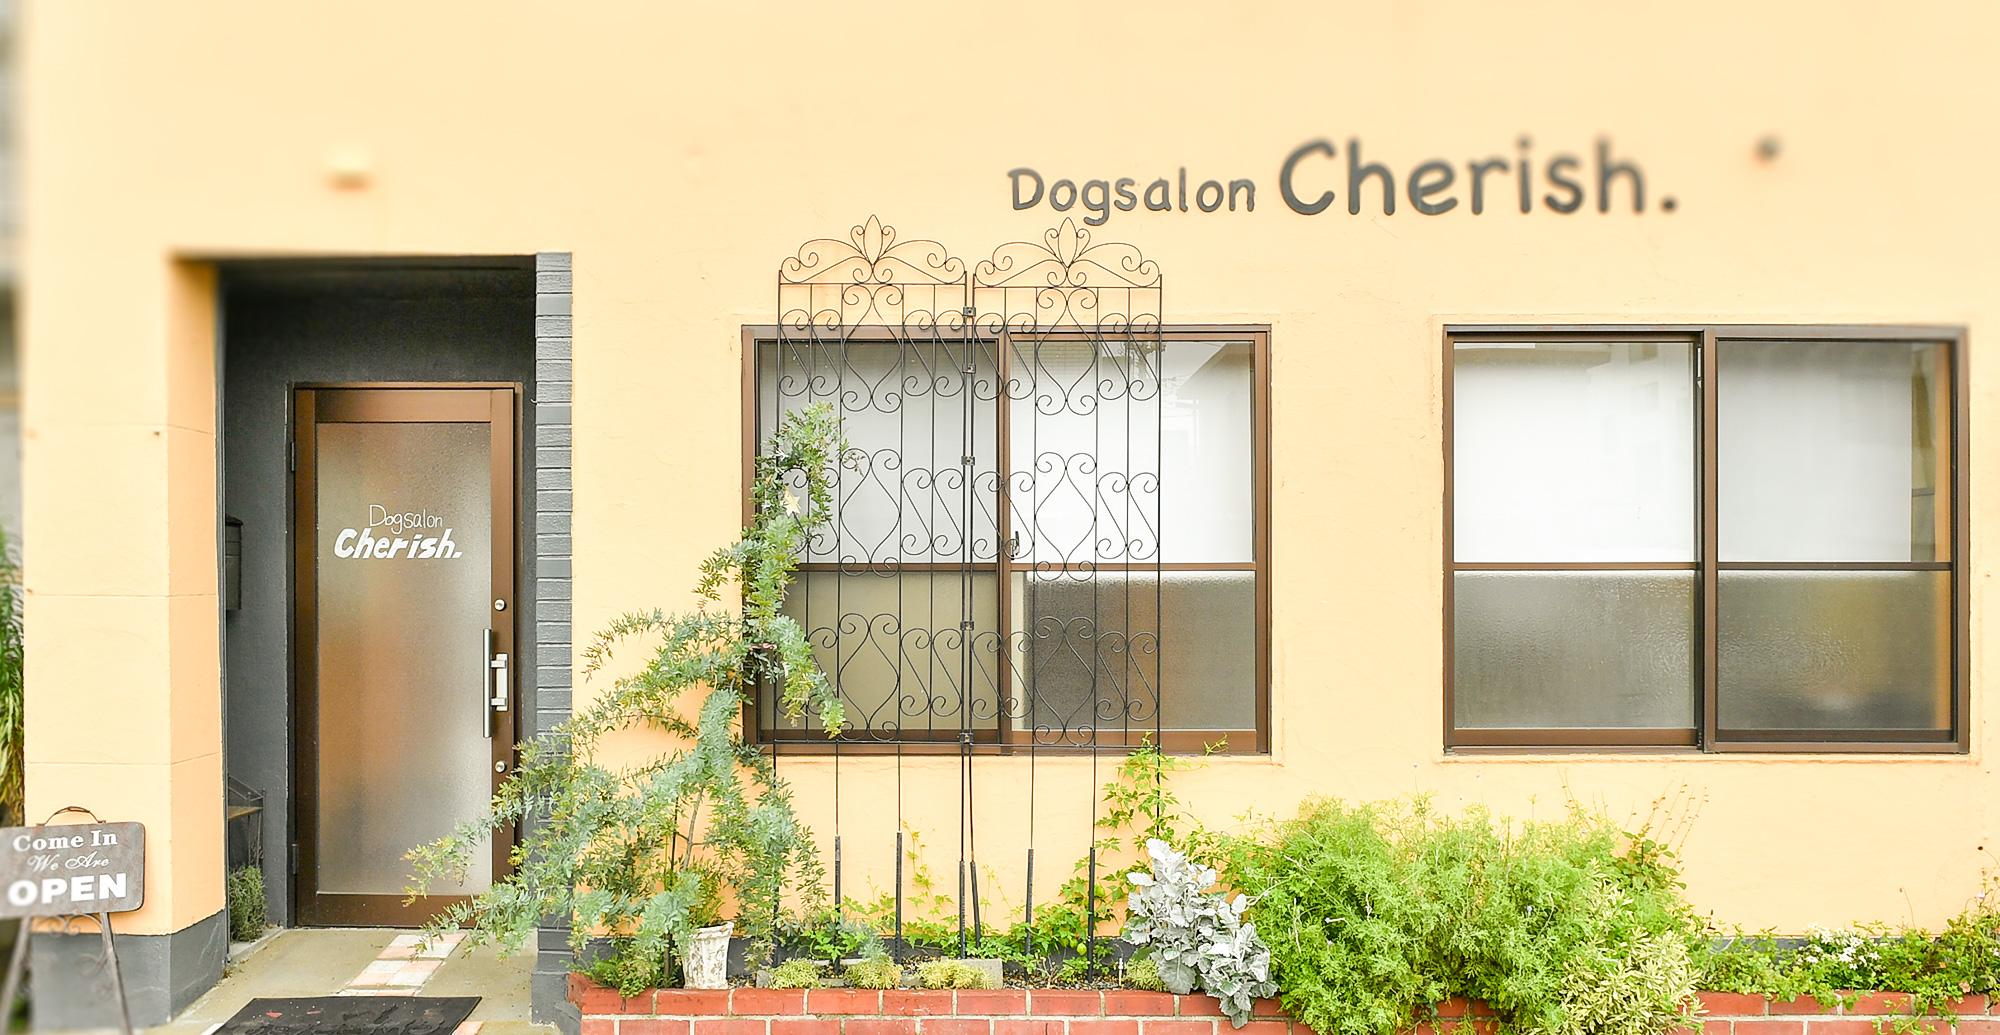 Dogsalon Cherish.